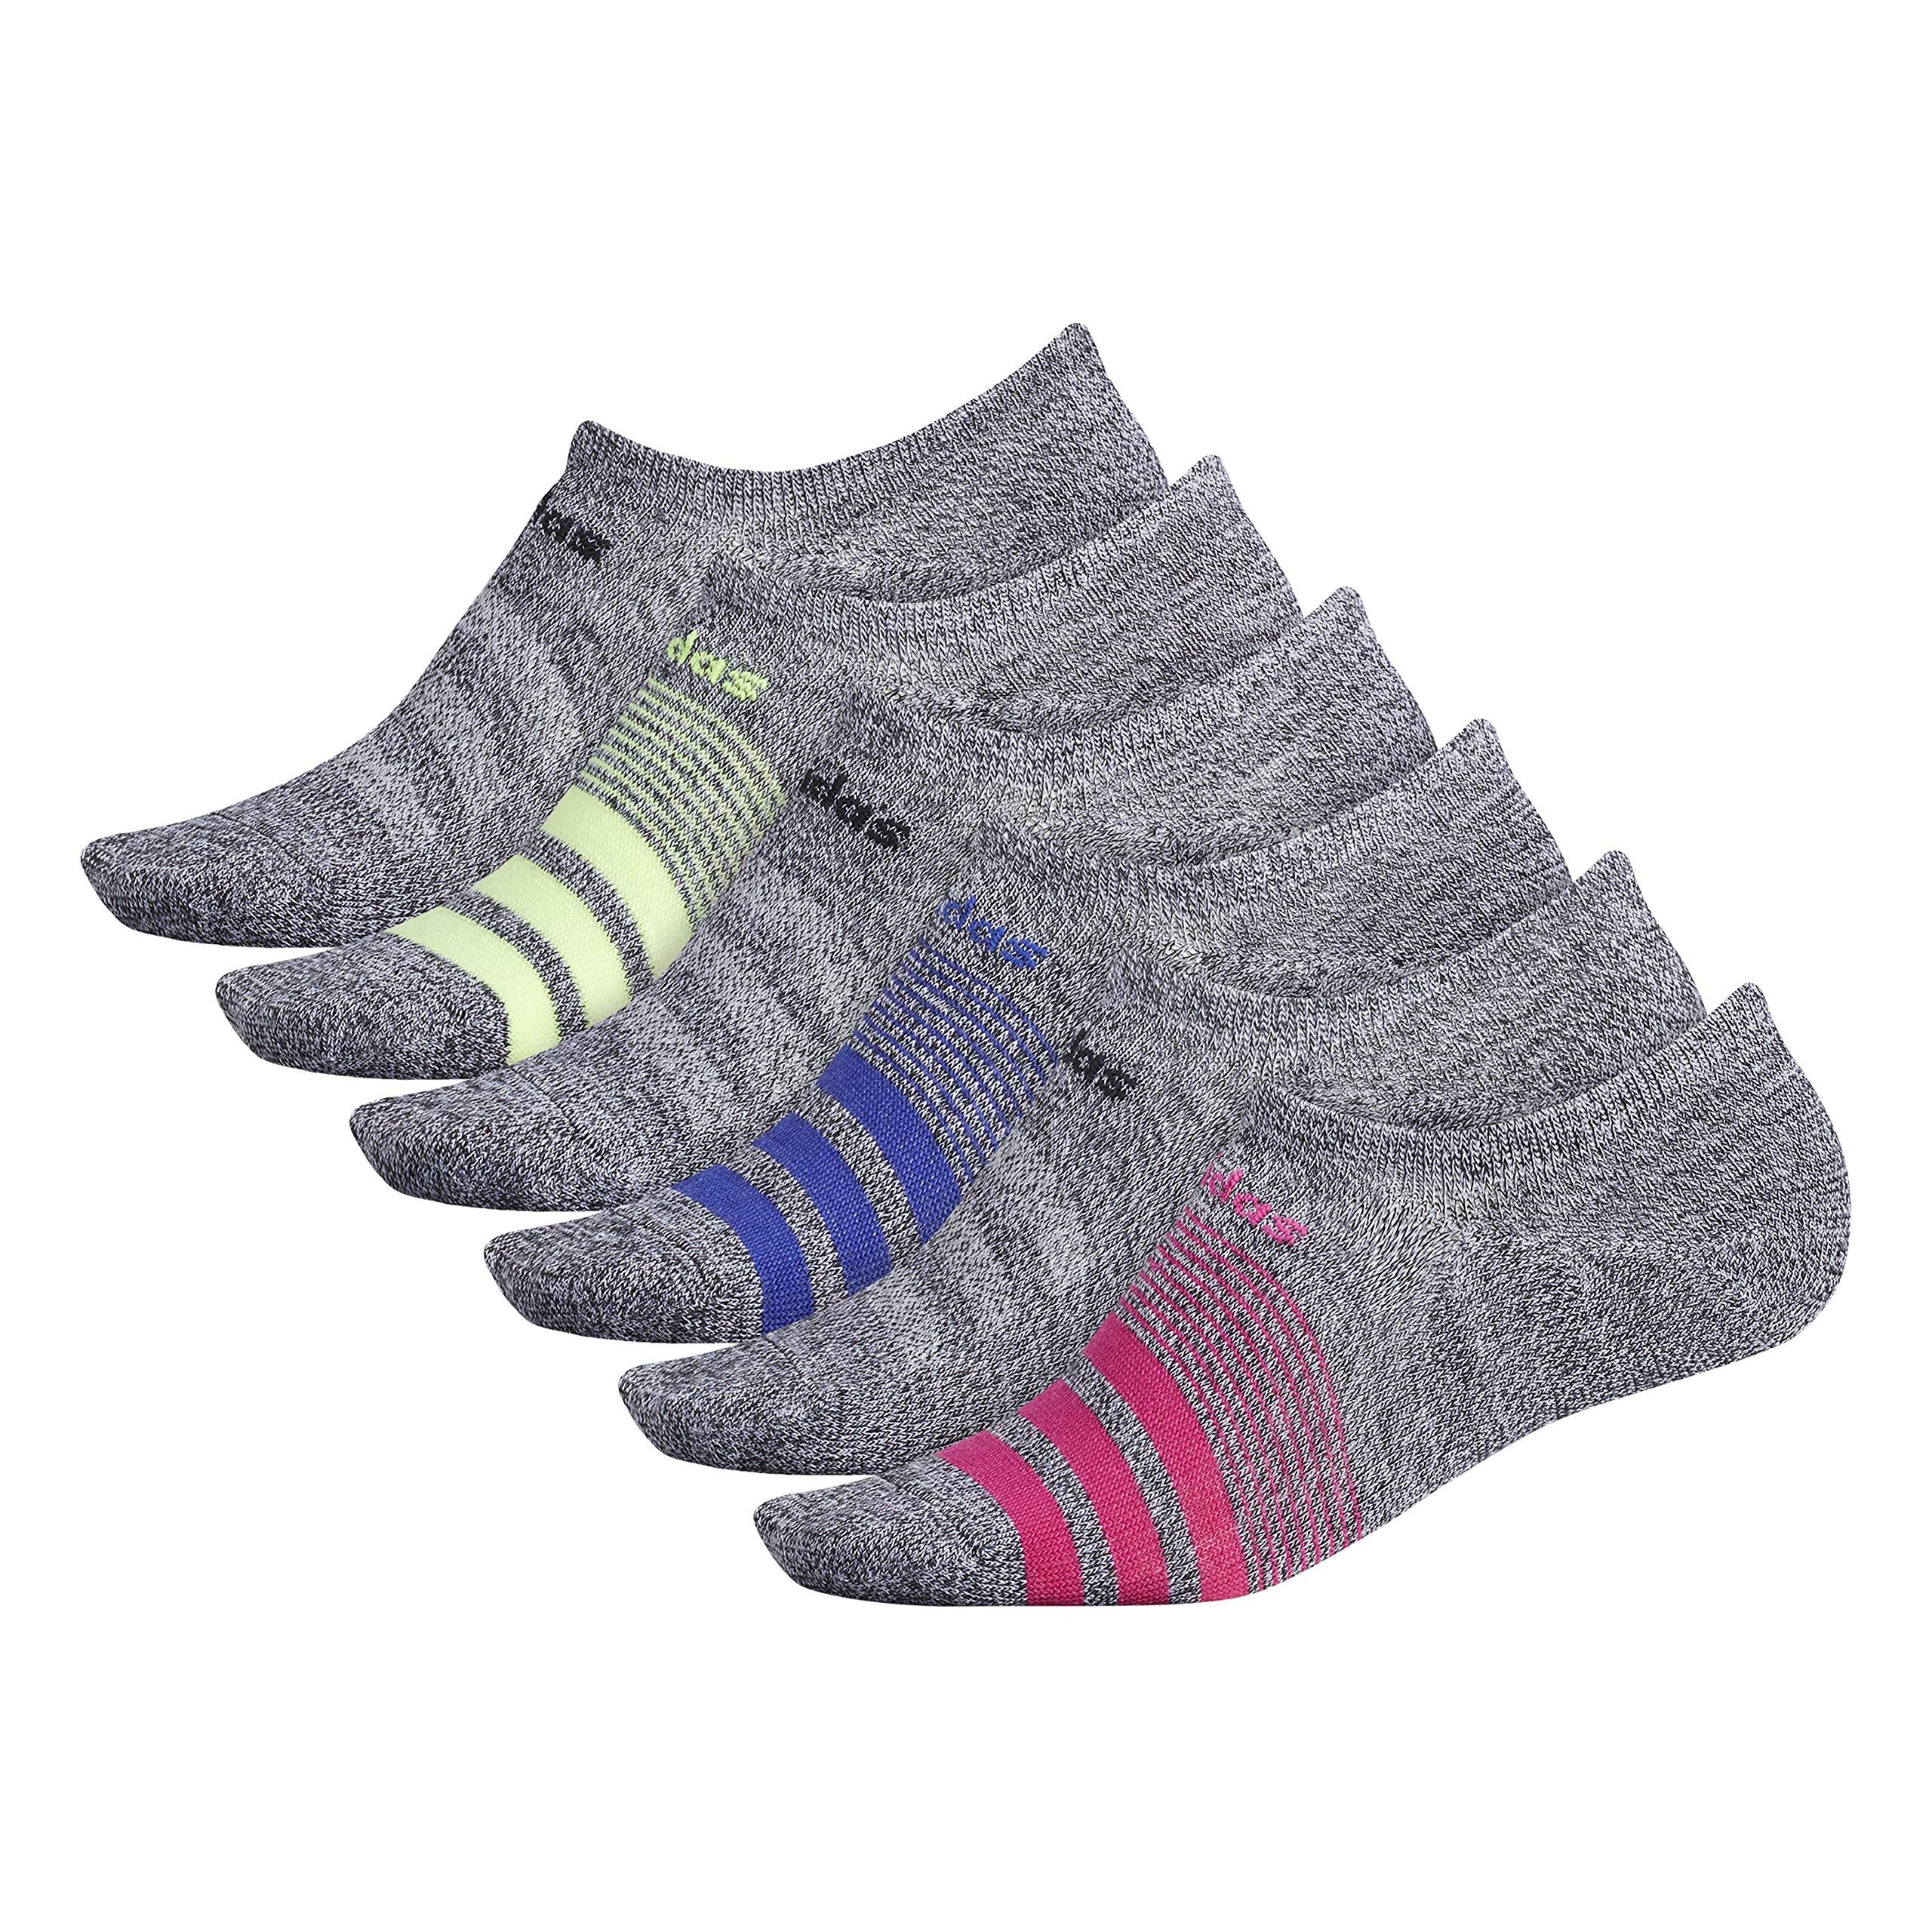 adidas Women's Superlite Super No Show Socks (6-Pair), Black - White Marl/Real Magenta/Black/Active Blue/Hi, Medium, (Shoe Size 5-10) by adidas